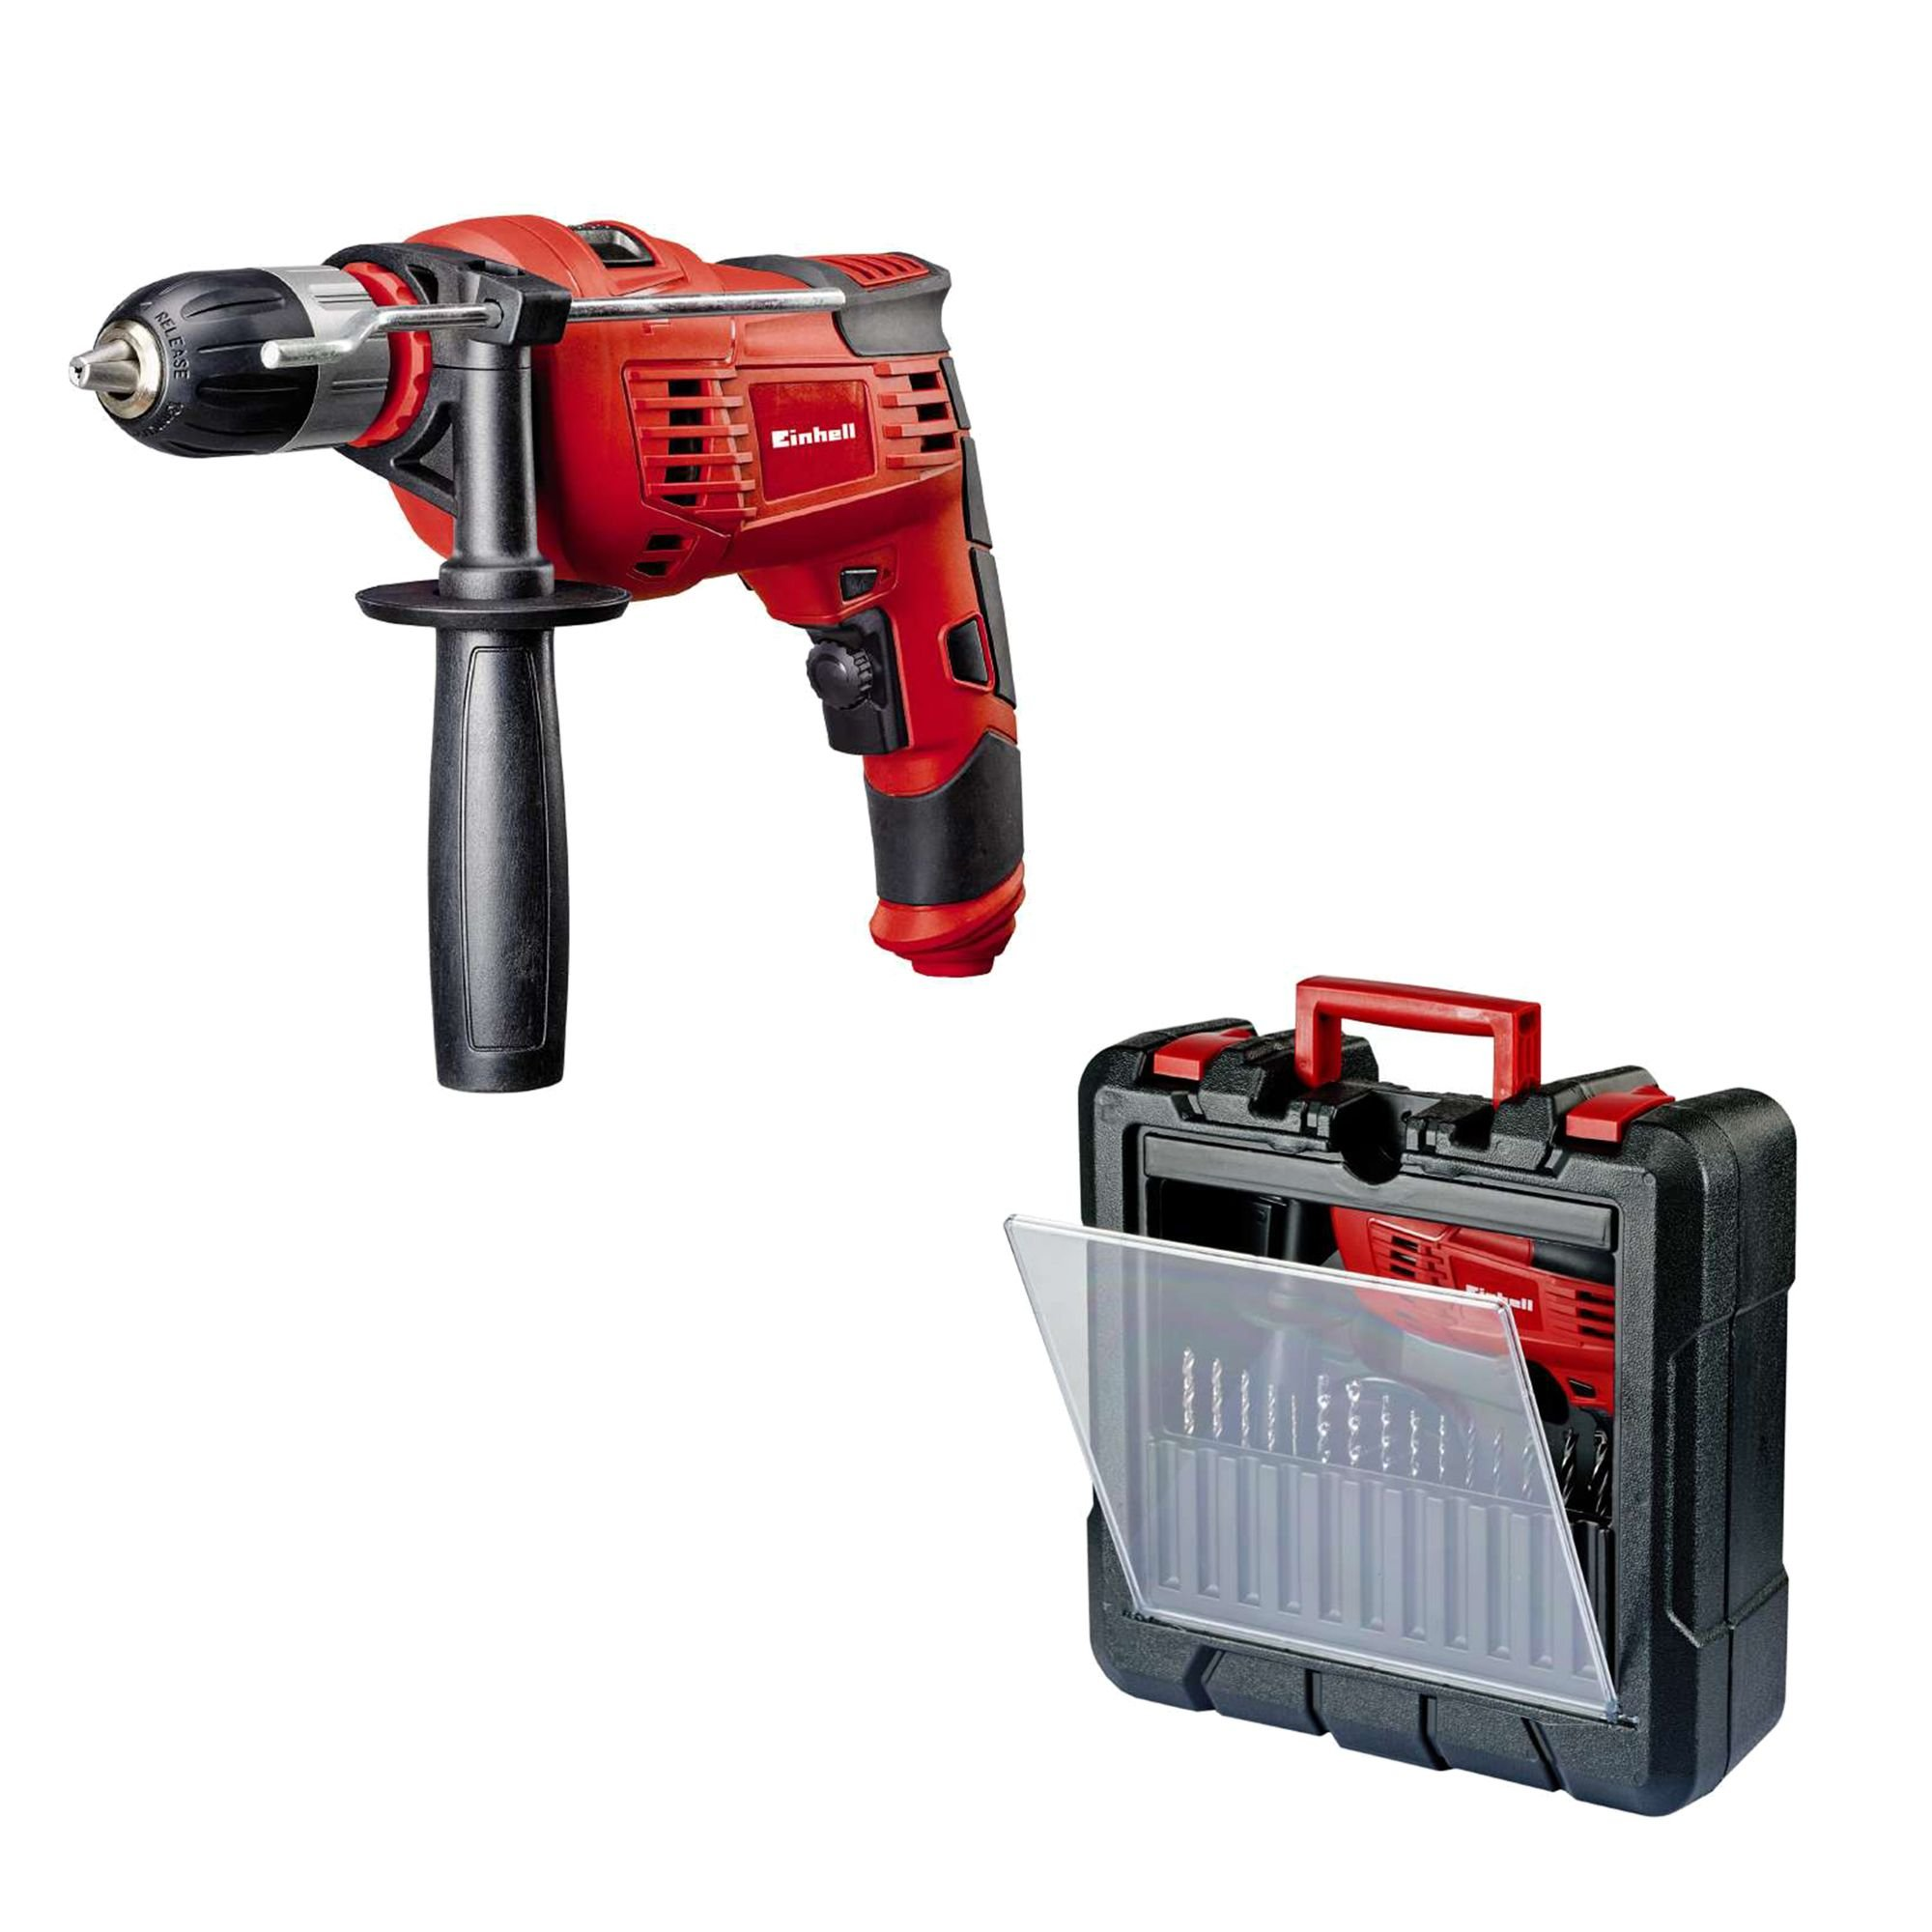 Einhell-Schlagbohrmaschine-TC-ID-1000-Kit-1010-W-1-Gang-Bohrleistung–Holz-32-mm–Metall-13-mm–Beton-16-mm-13-mm-Schnellspannbohrfutter-inkl-Koffer